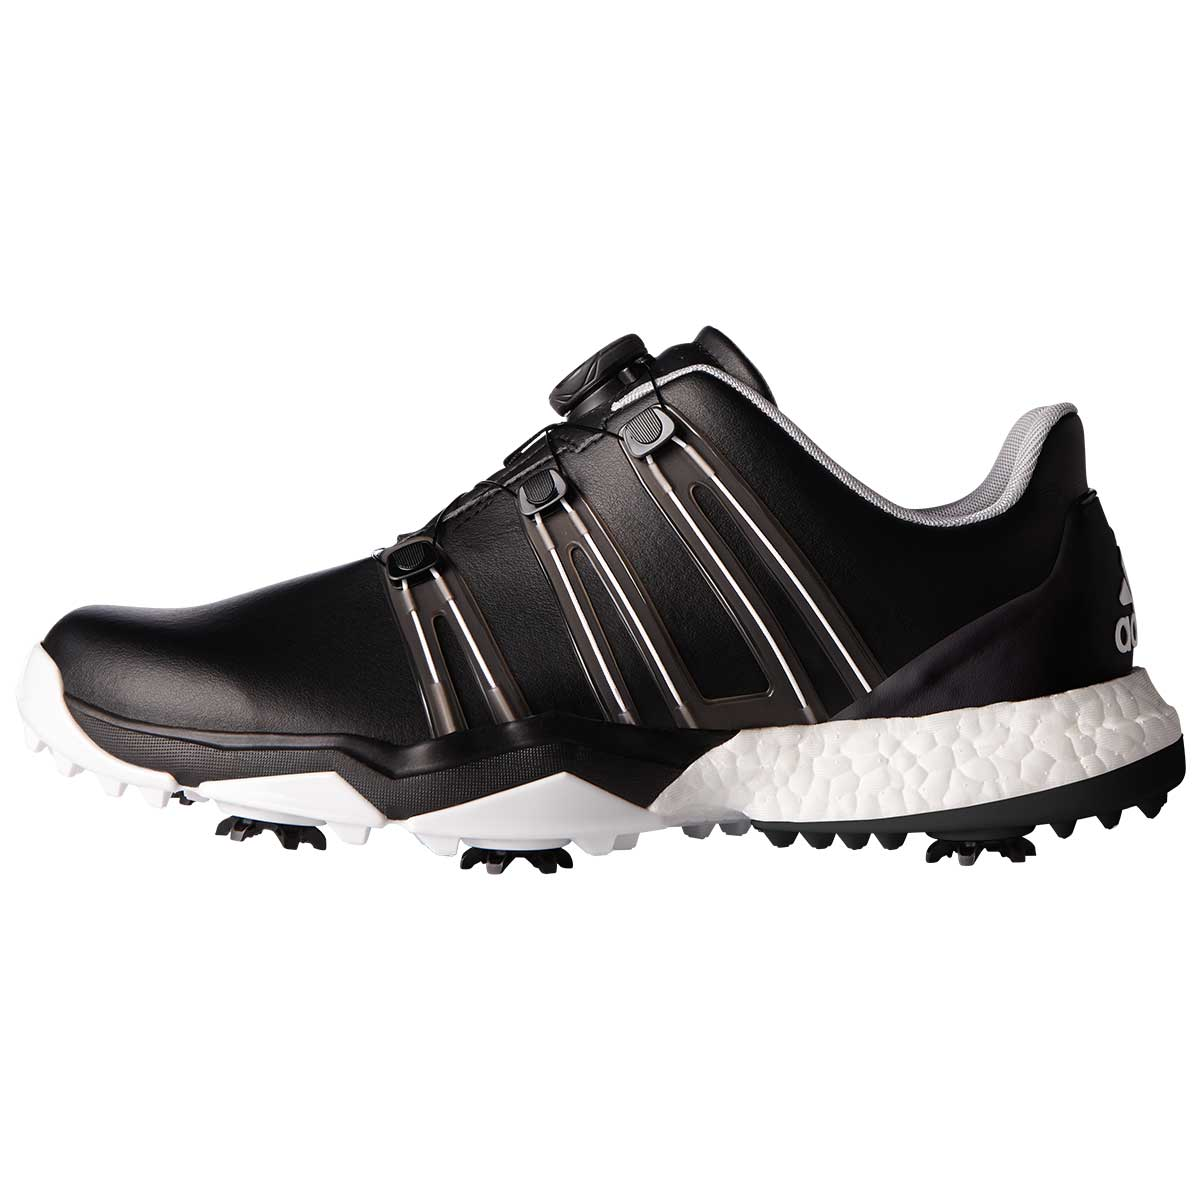 adidas Men's Powerband BOA Boost Golf Shoe - Black/White